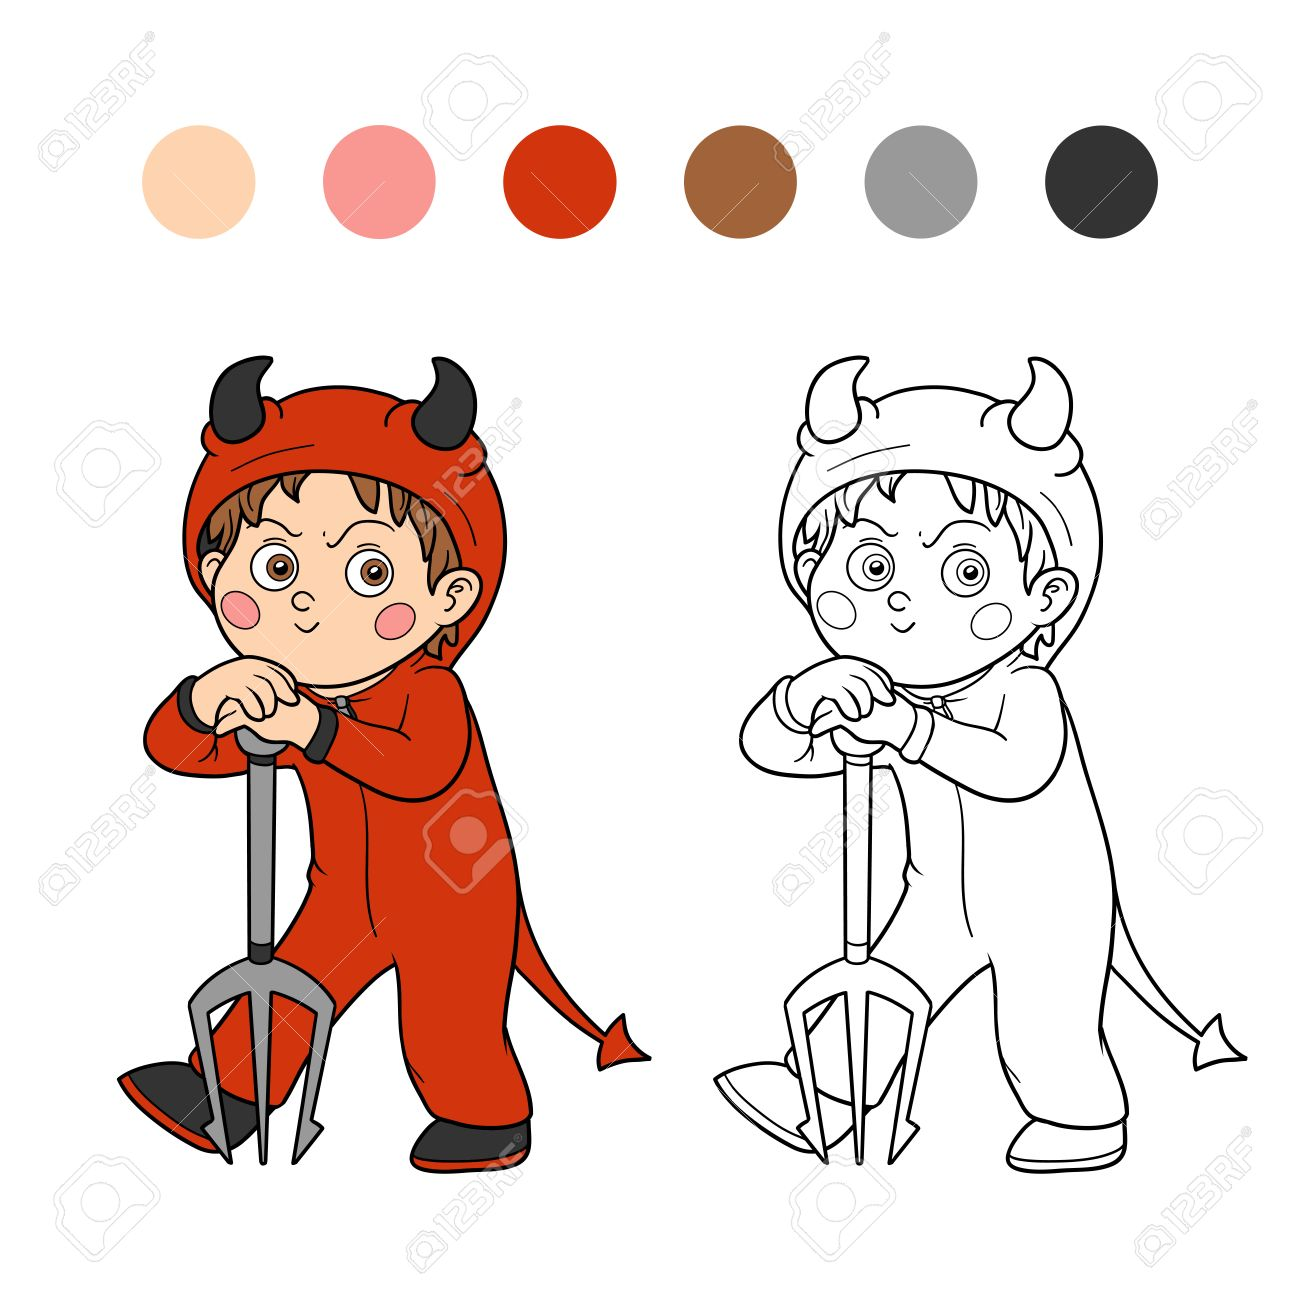 Libro Para Colorear, Juegos Para Niños: Carácter De Halloween ...